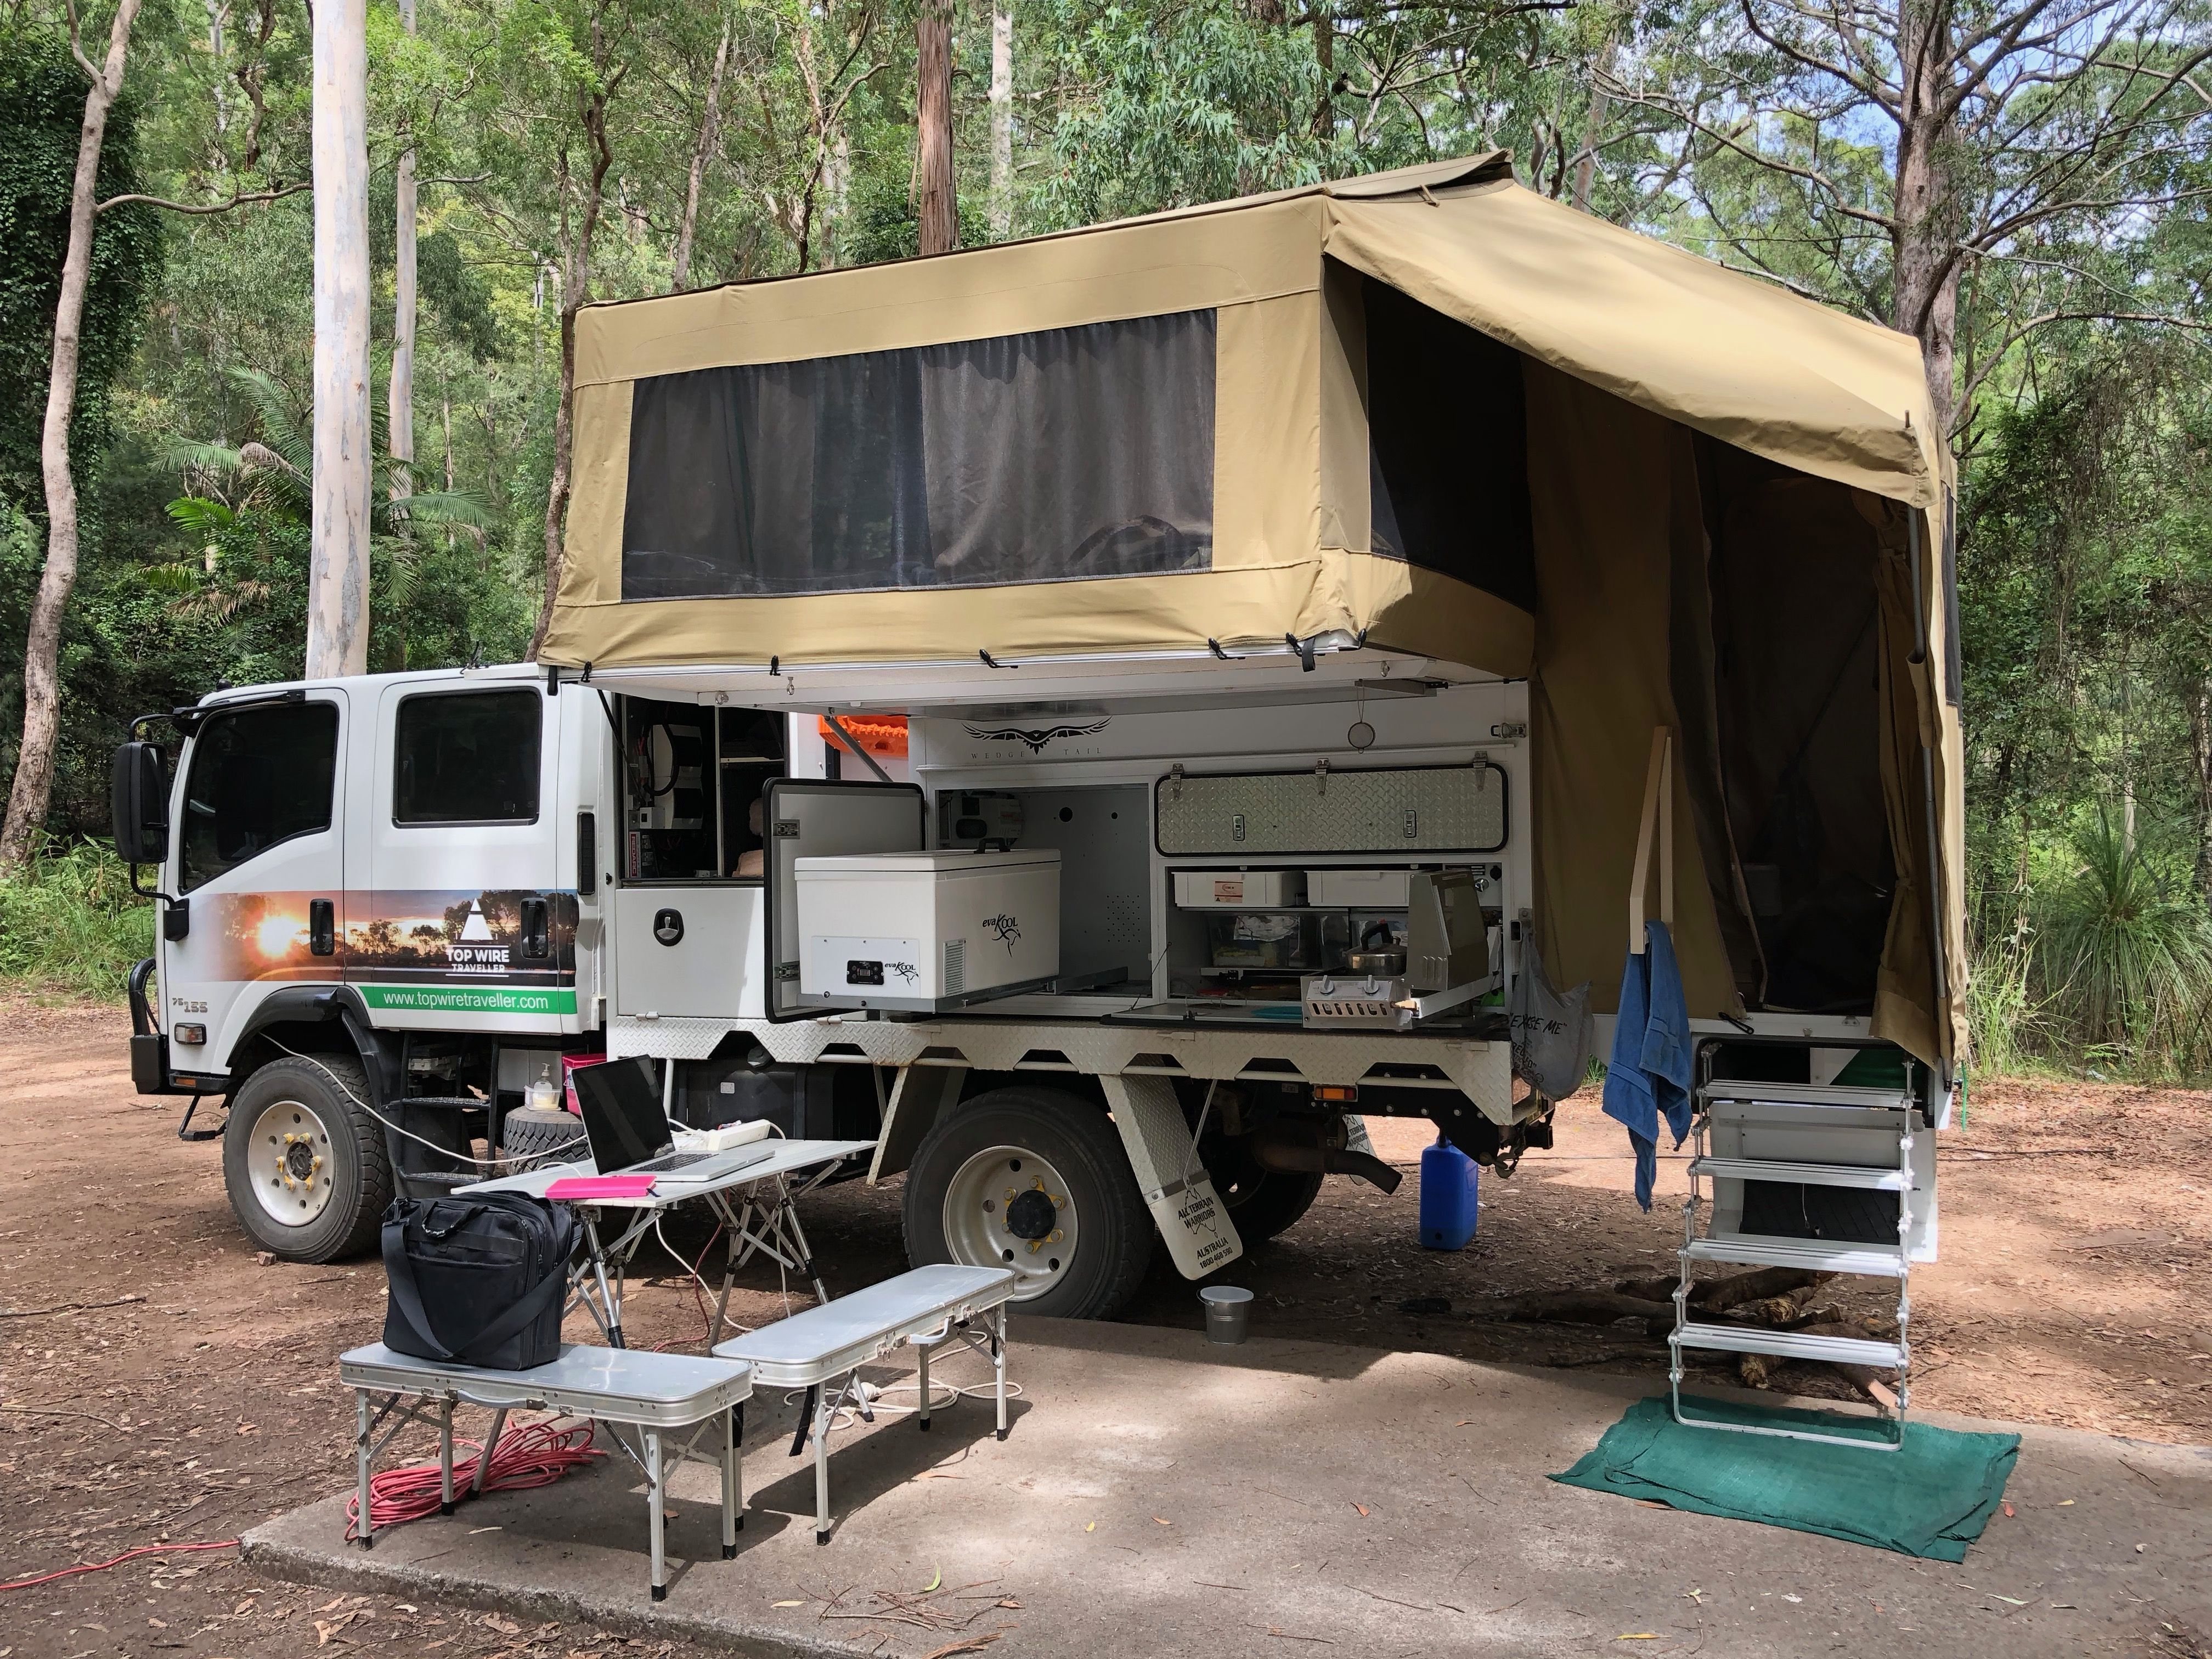 My Office Gap Creek Campground Watagans National Park Nsw Seeaustralia Watagans Gap Creek Mobileoffice Slide In Camper Outback Camping